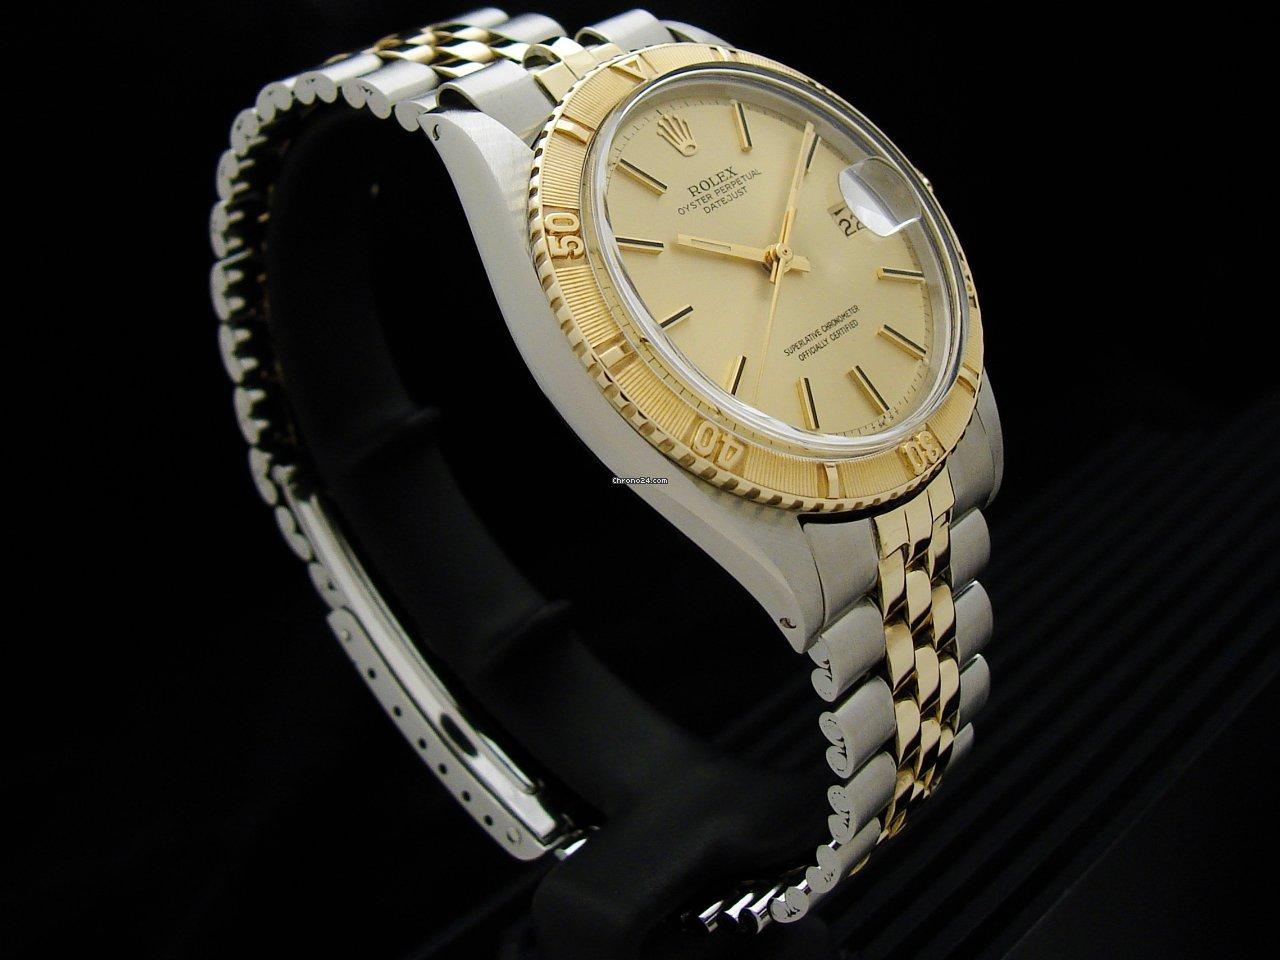 Rolex Datejust Turn-O-Graph 1625 1971 usato